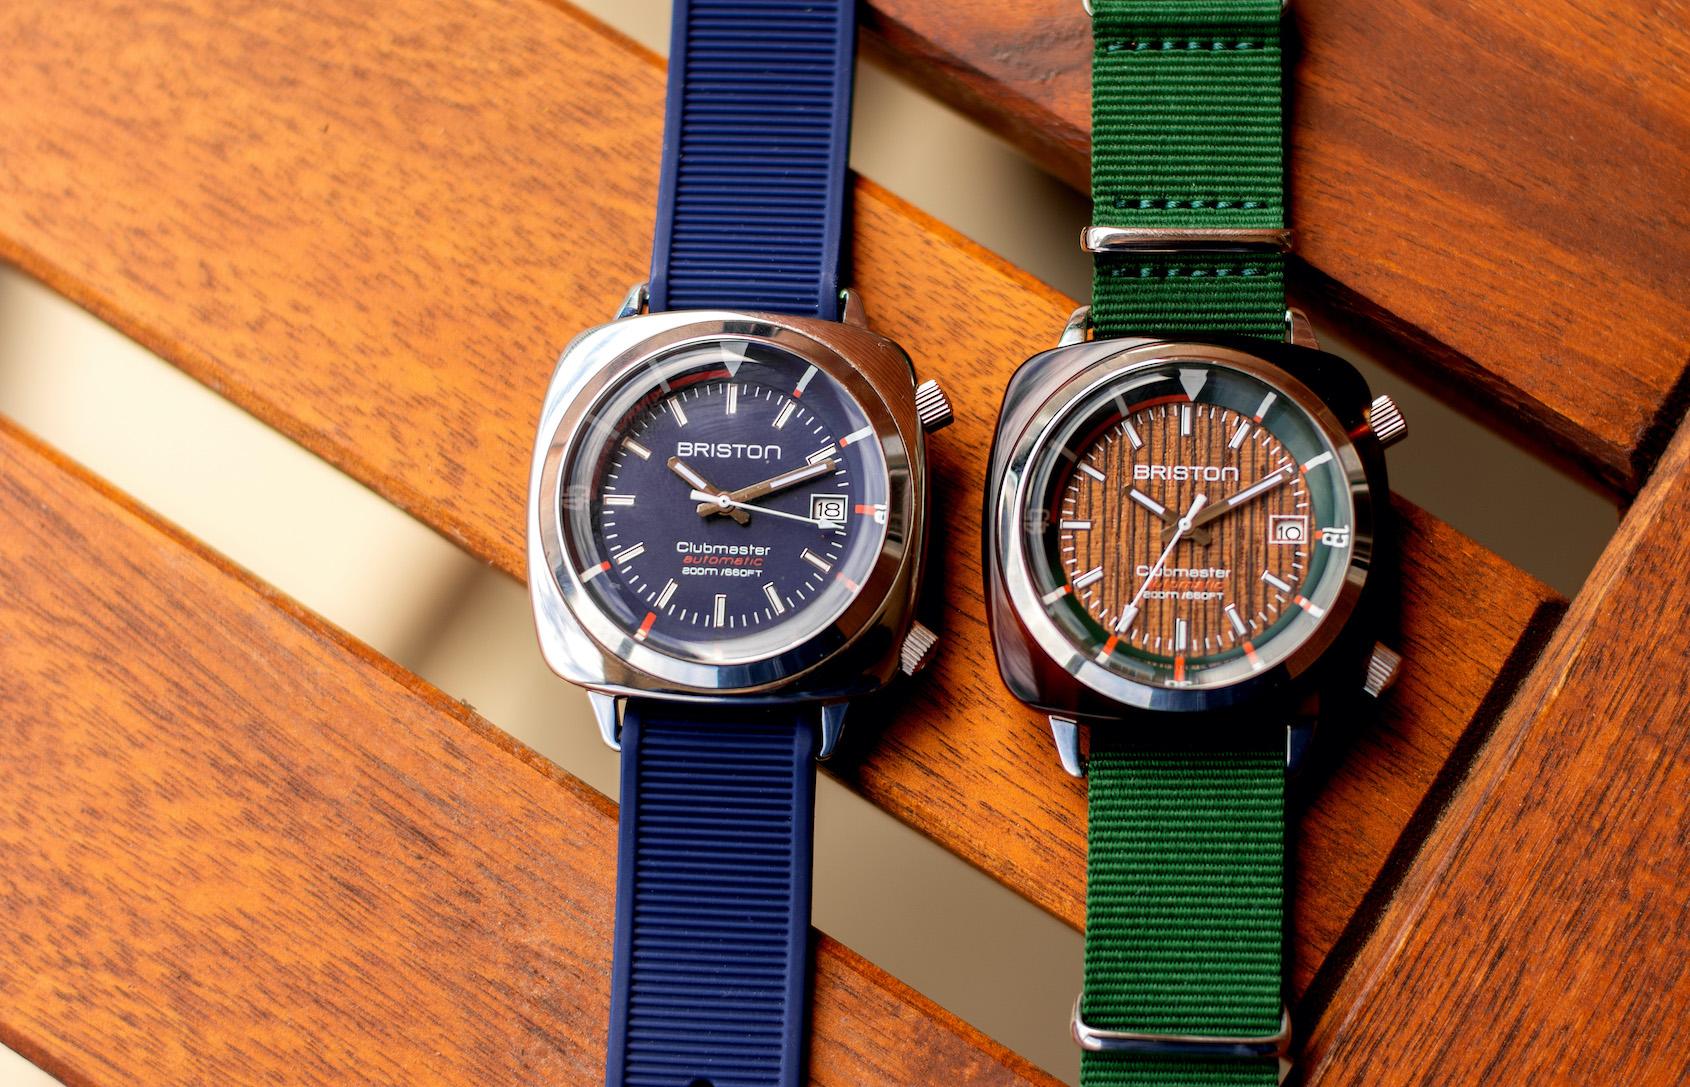 MICRO MONDAYS: Briston Watches & the Clubmaster Diver